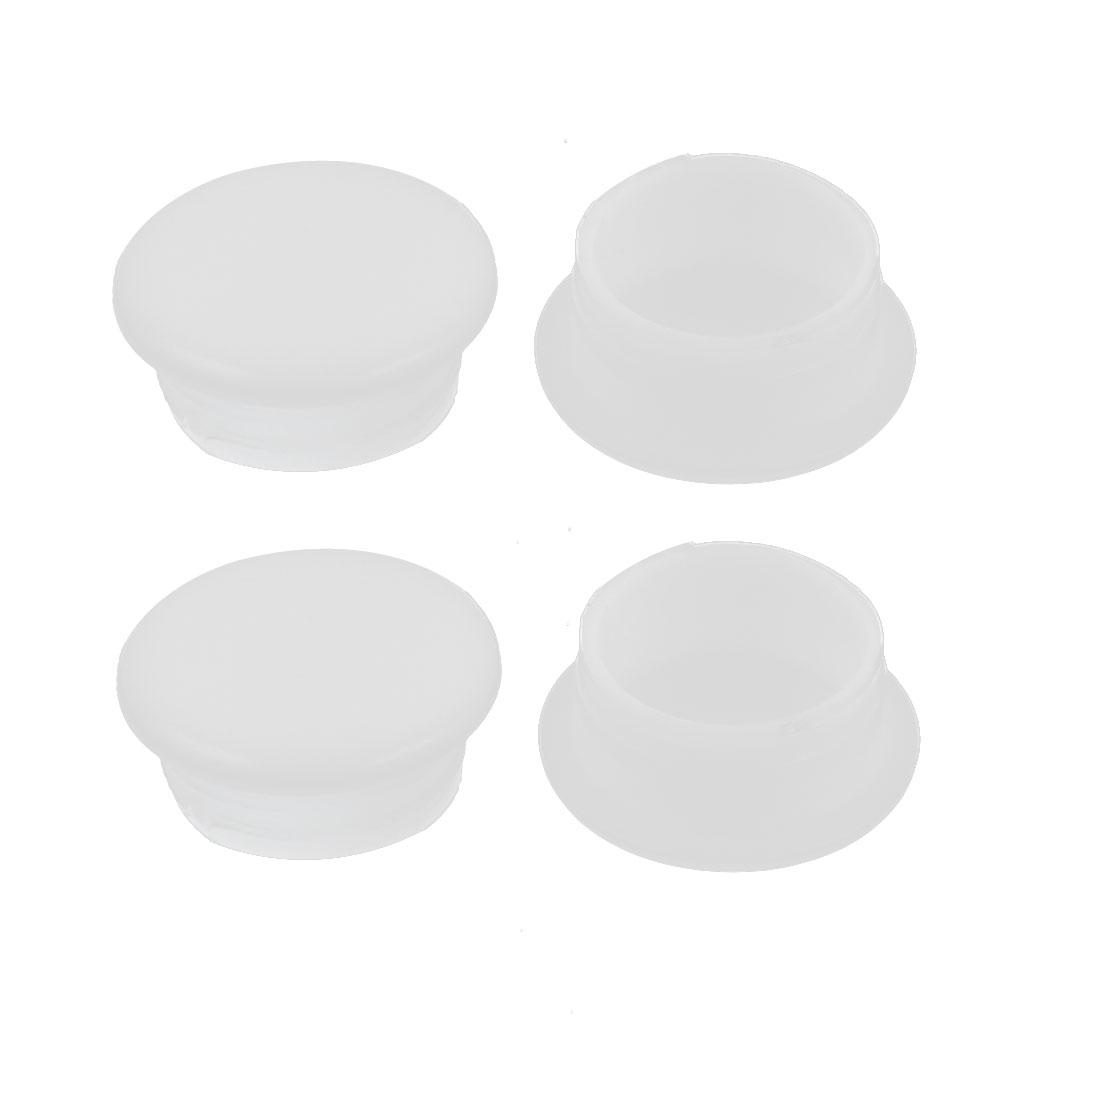 4Pcs White Plastic 12mm Dia Round Tubing Tube Insert Caps Covers